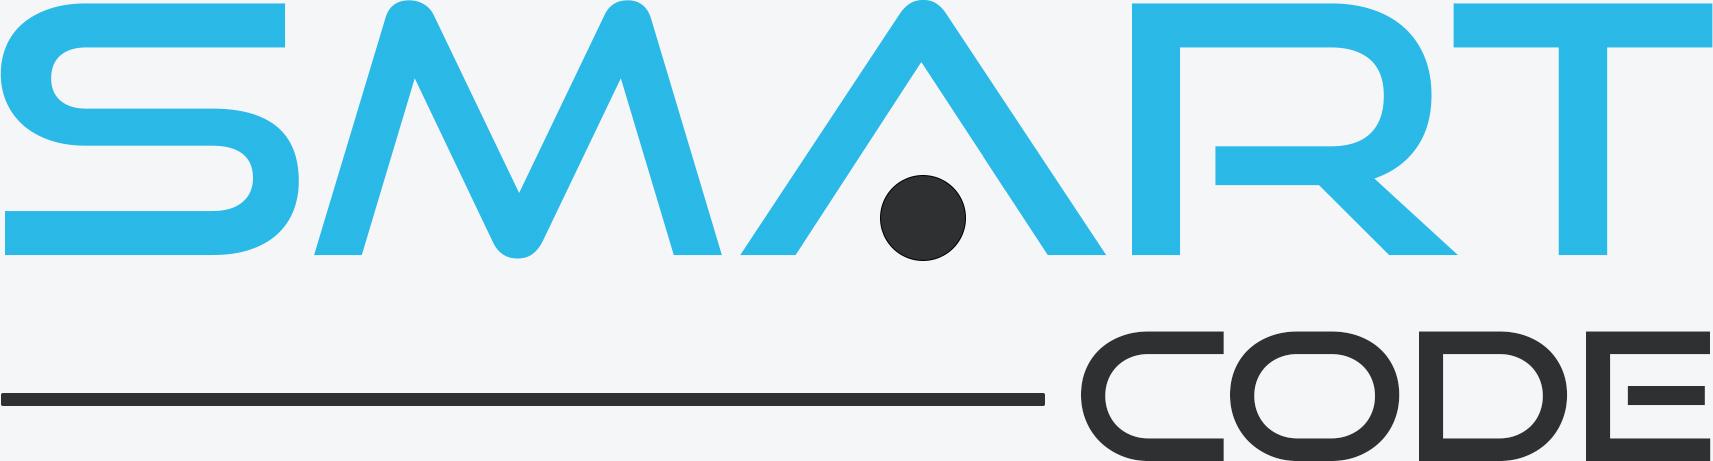 SmartCode – סמארטקוד